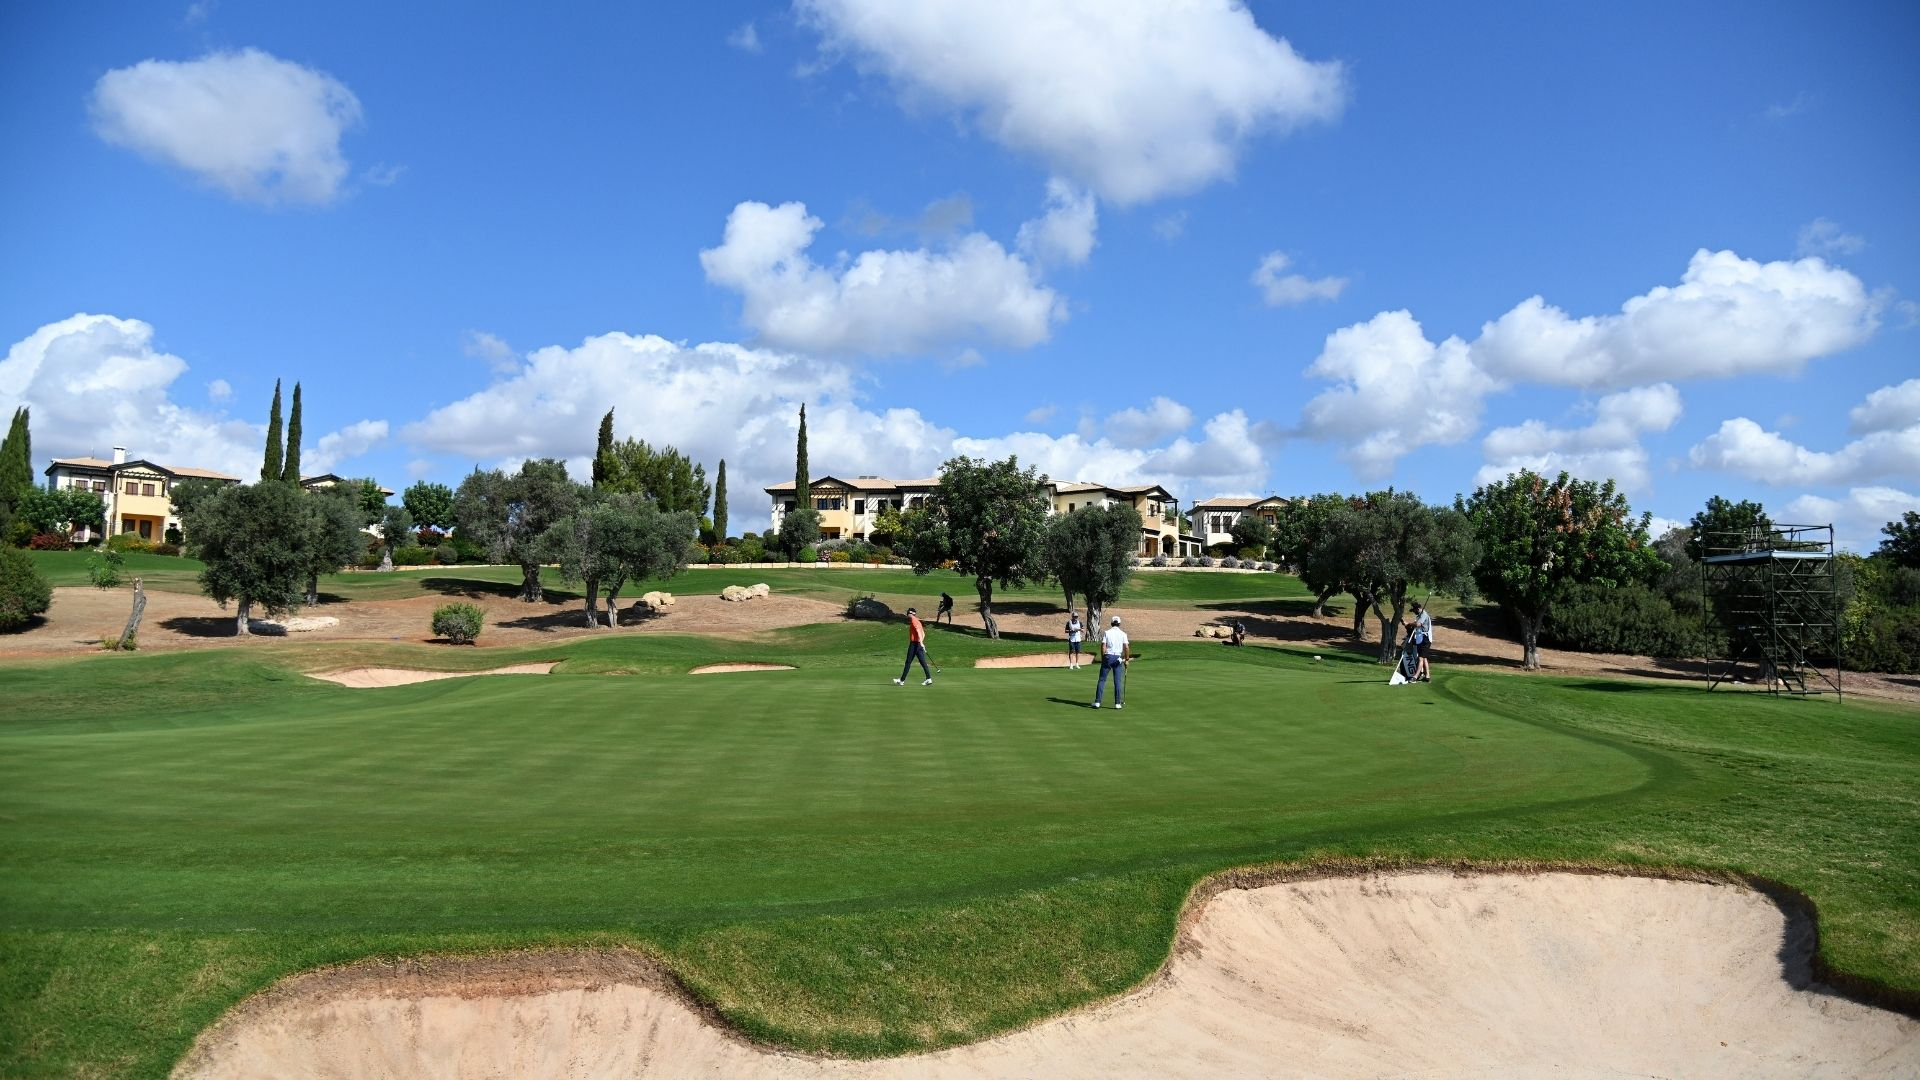 Golf and Corona in Europe